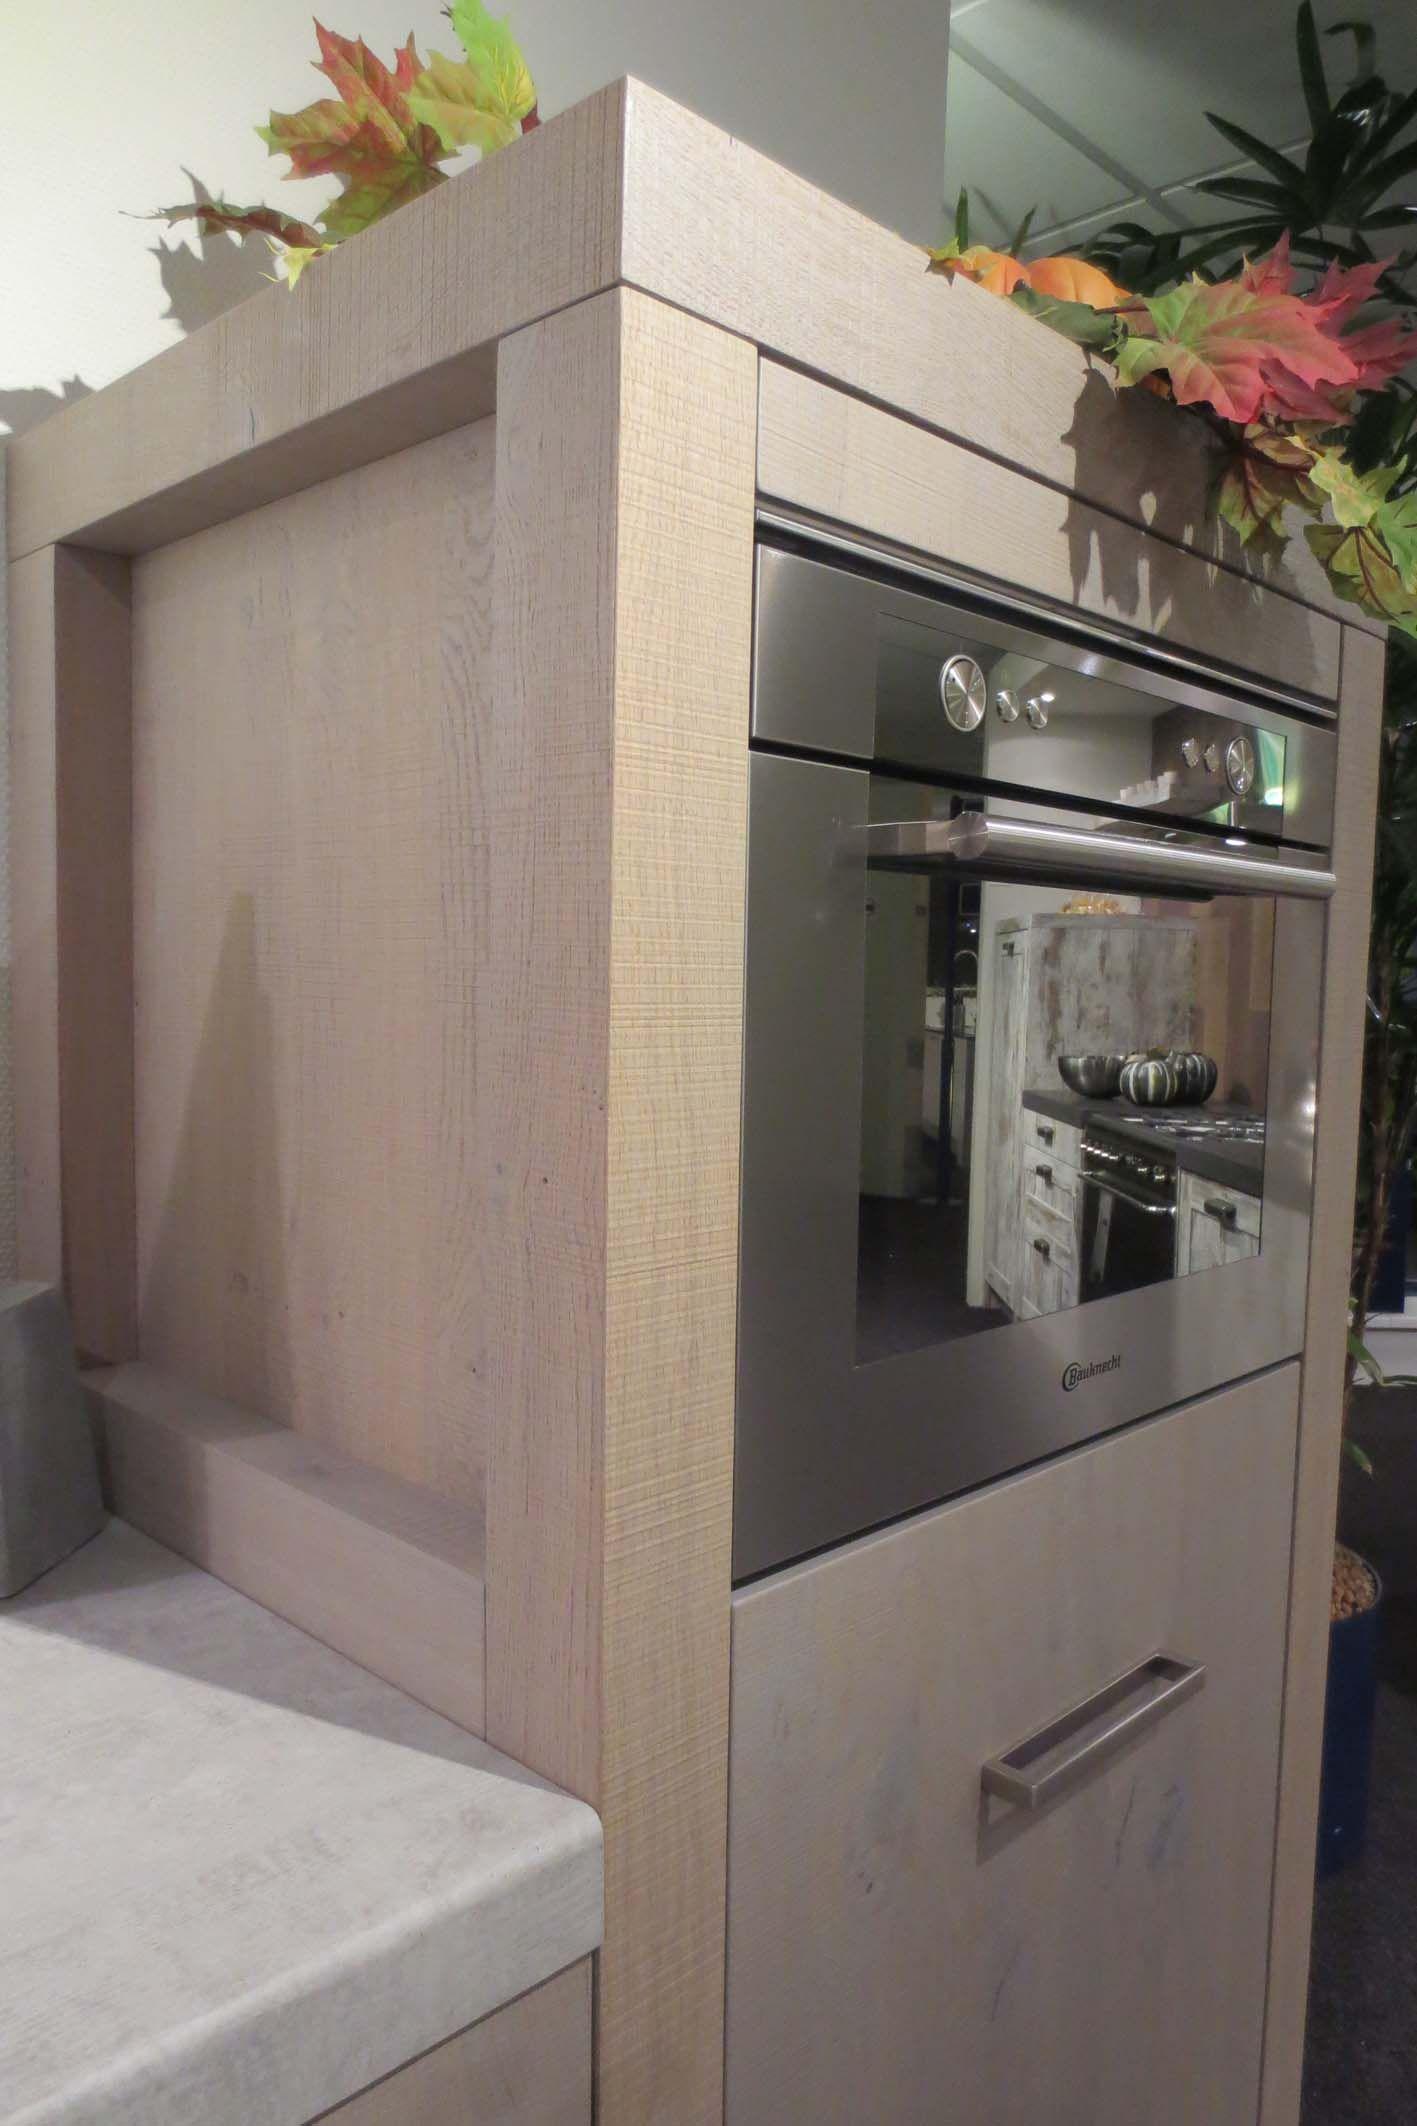 Het grootste keukenaanbod van nederland - Model keuken apparatuur fotos ...